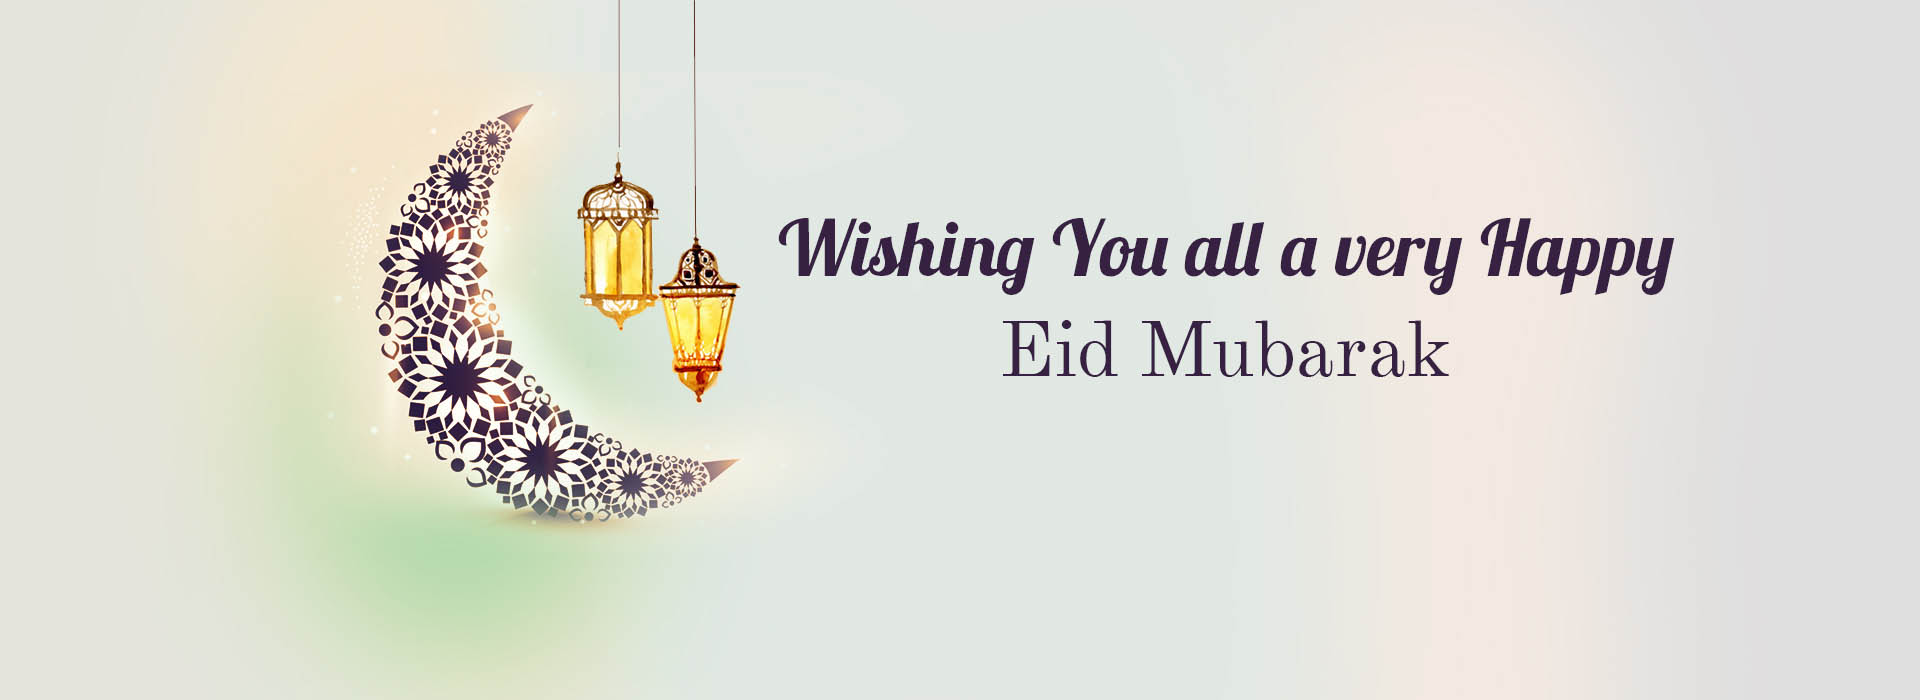 eid-mubarak-banner-2018